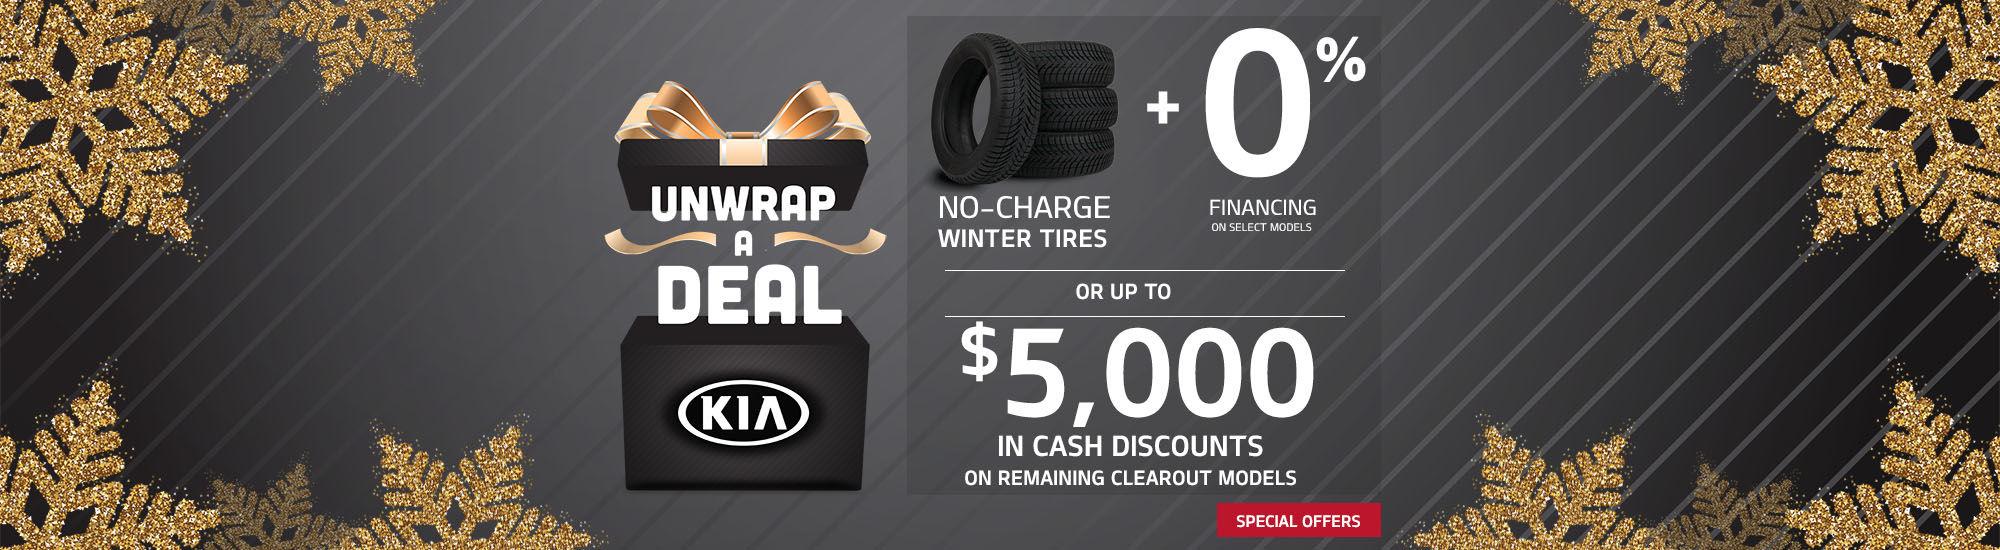 Kia Unwrap a deal